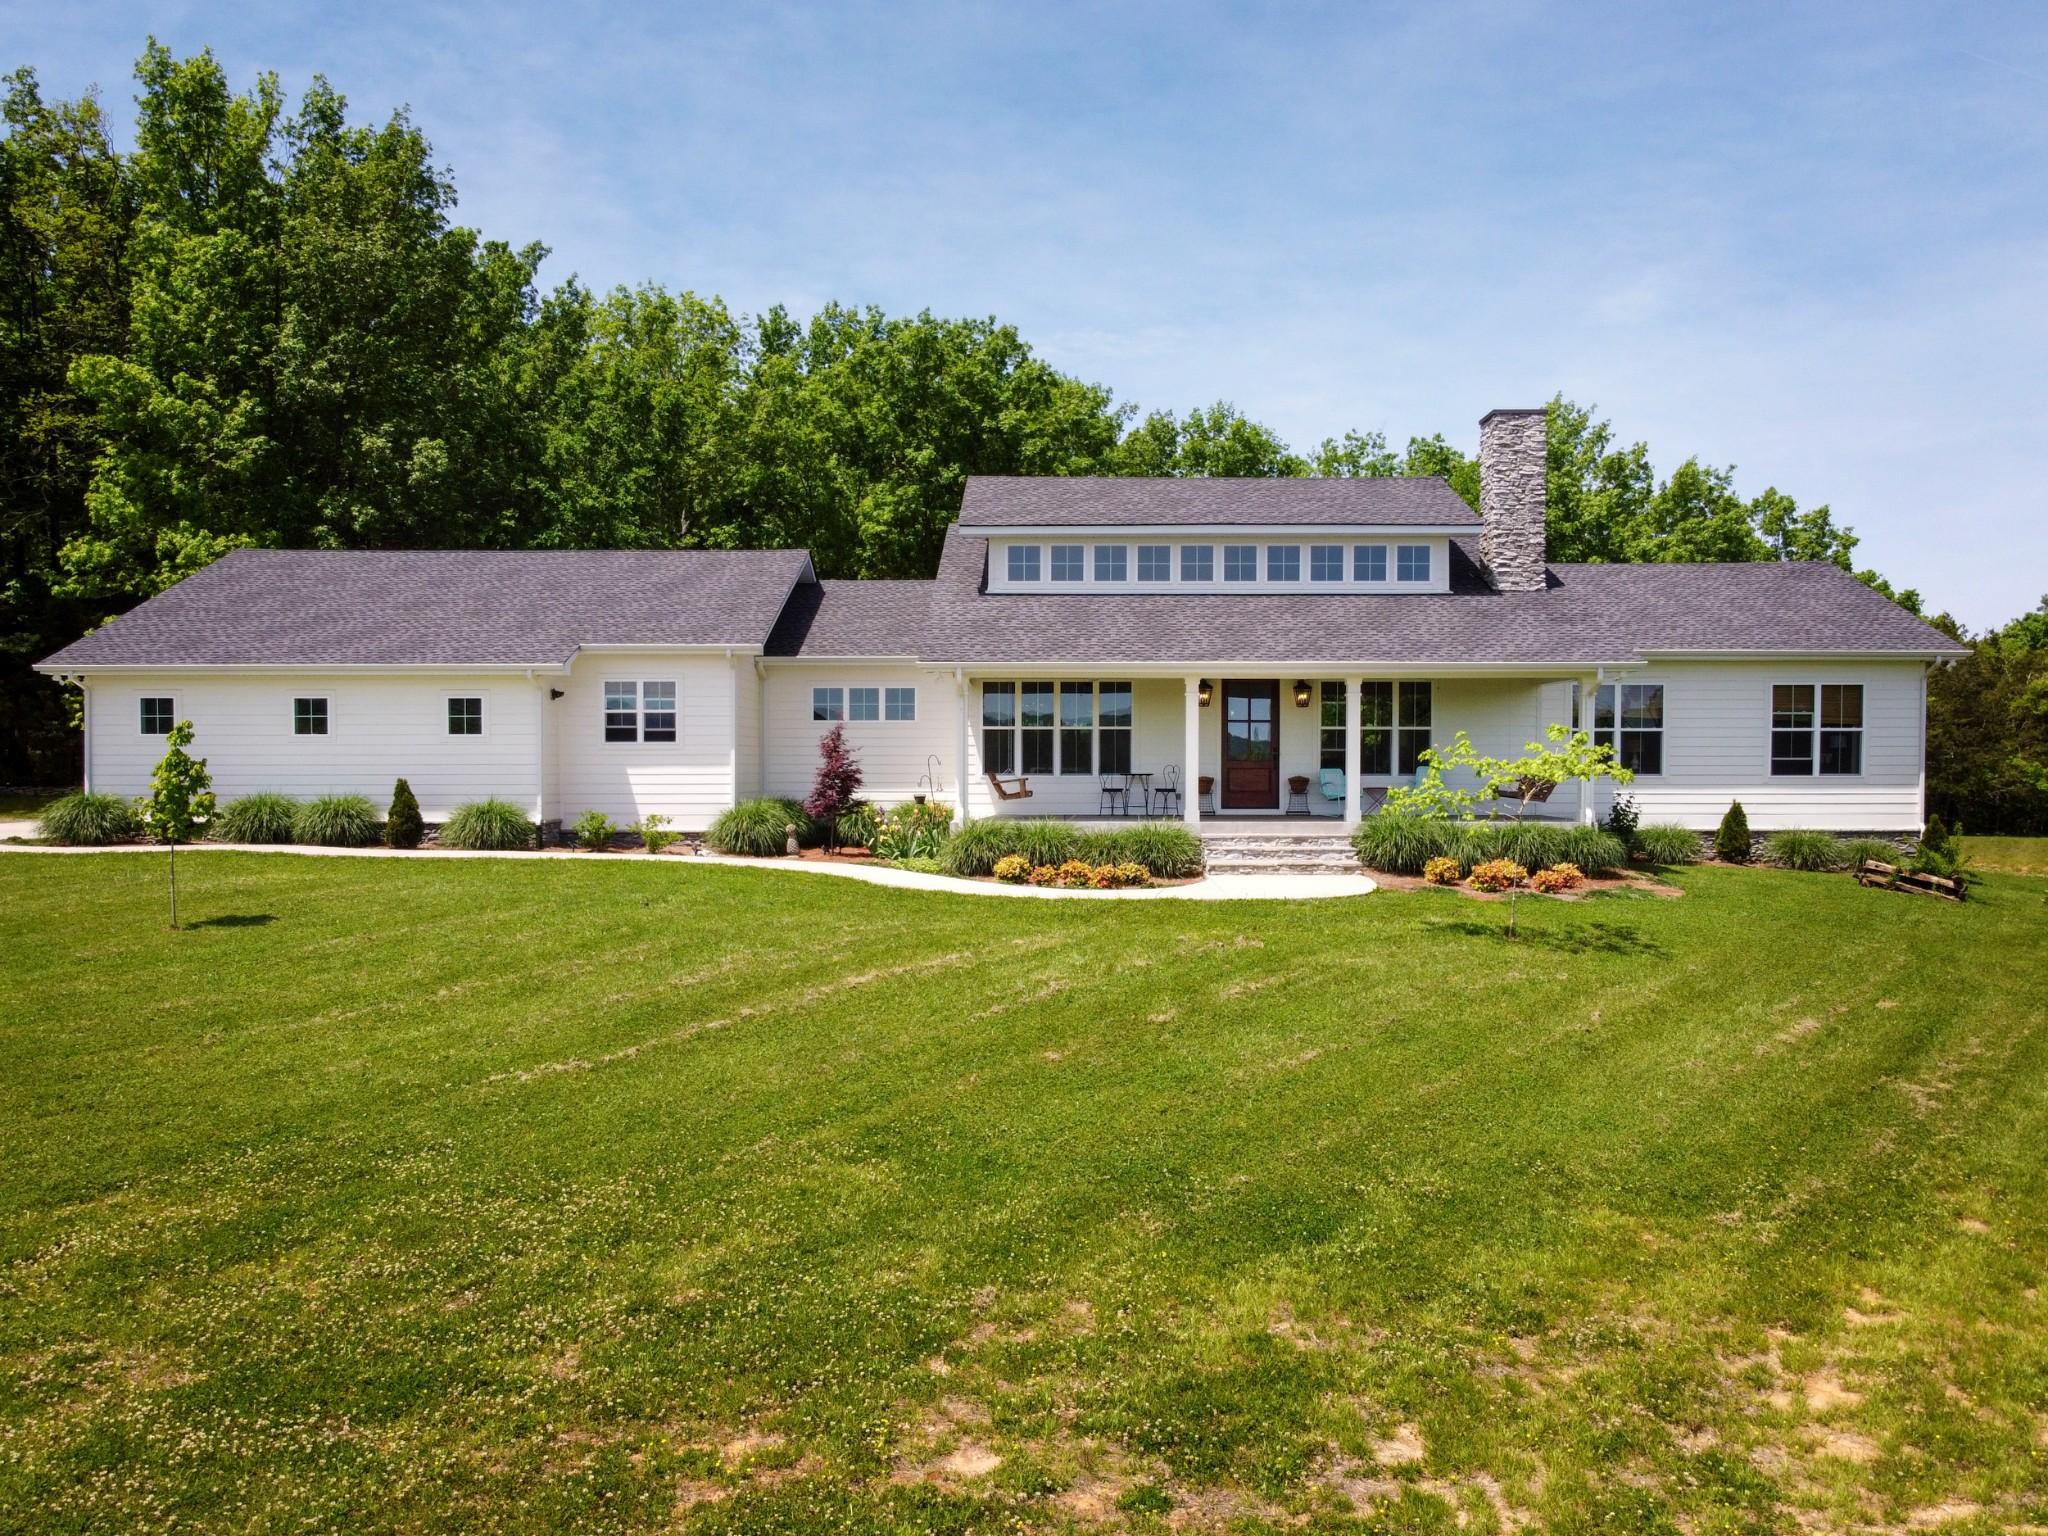 6400 Christiana Hoovers Gap Rd Property Photo - Christiana, TN real estate listing